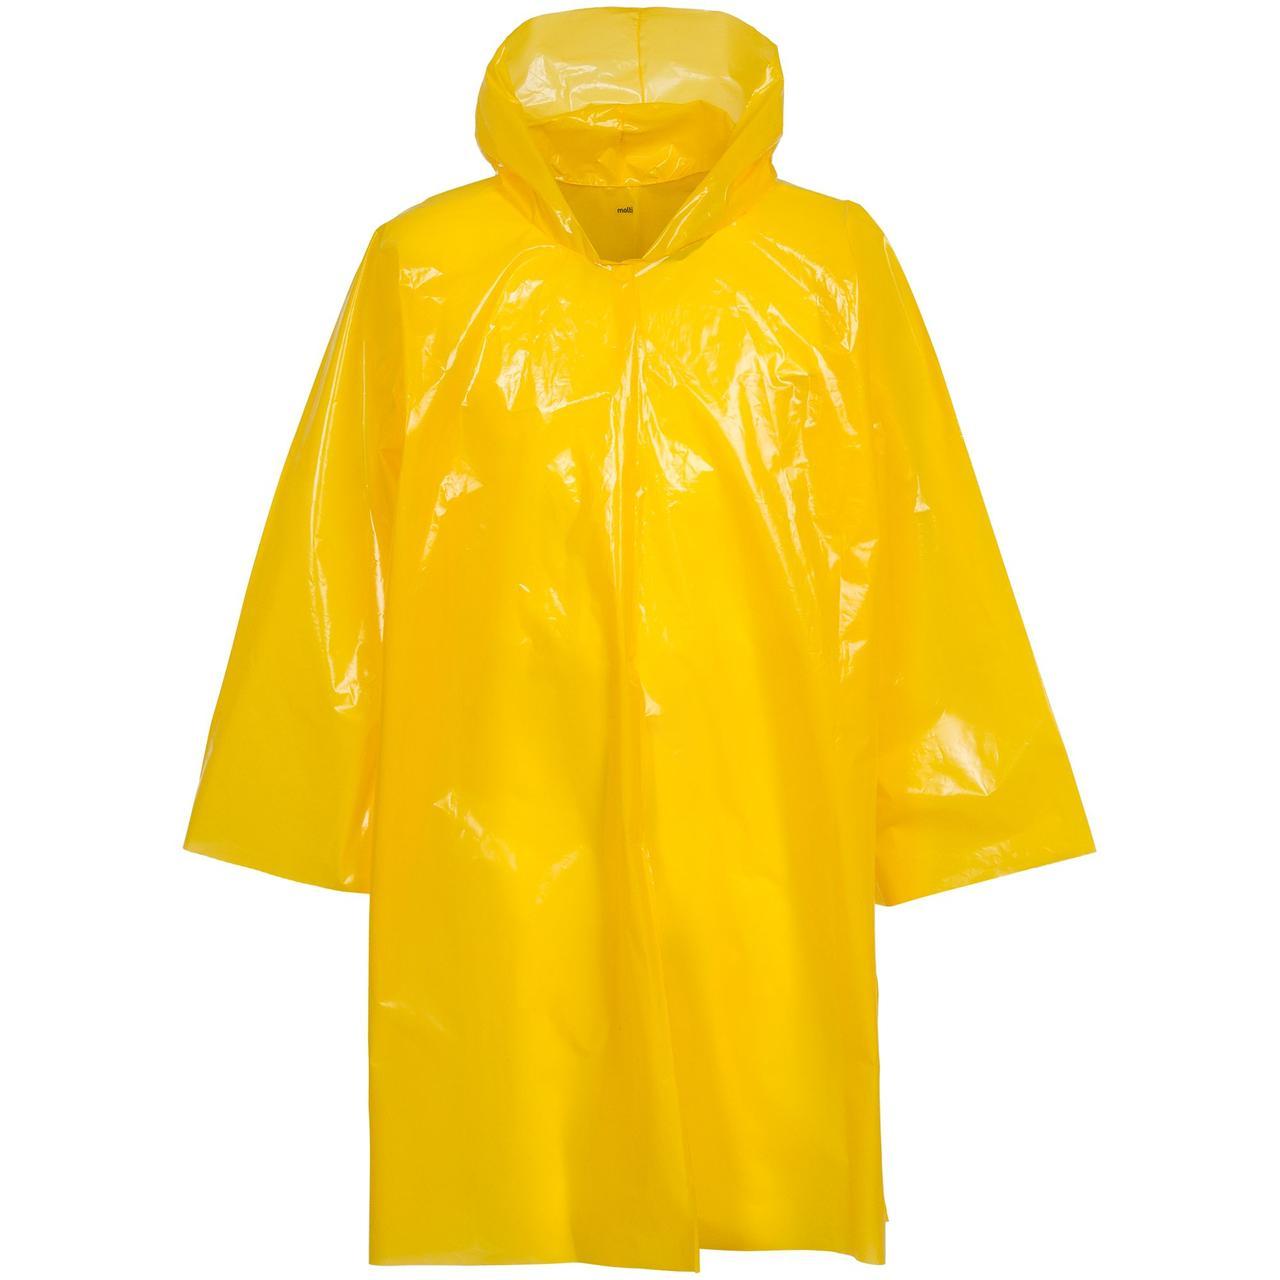 Дождевик-плащ CloudTime, желтый (артикул 11876.80)